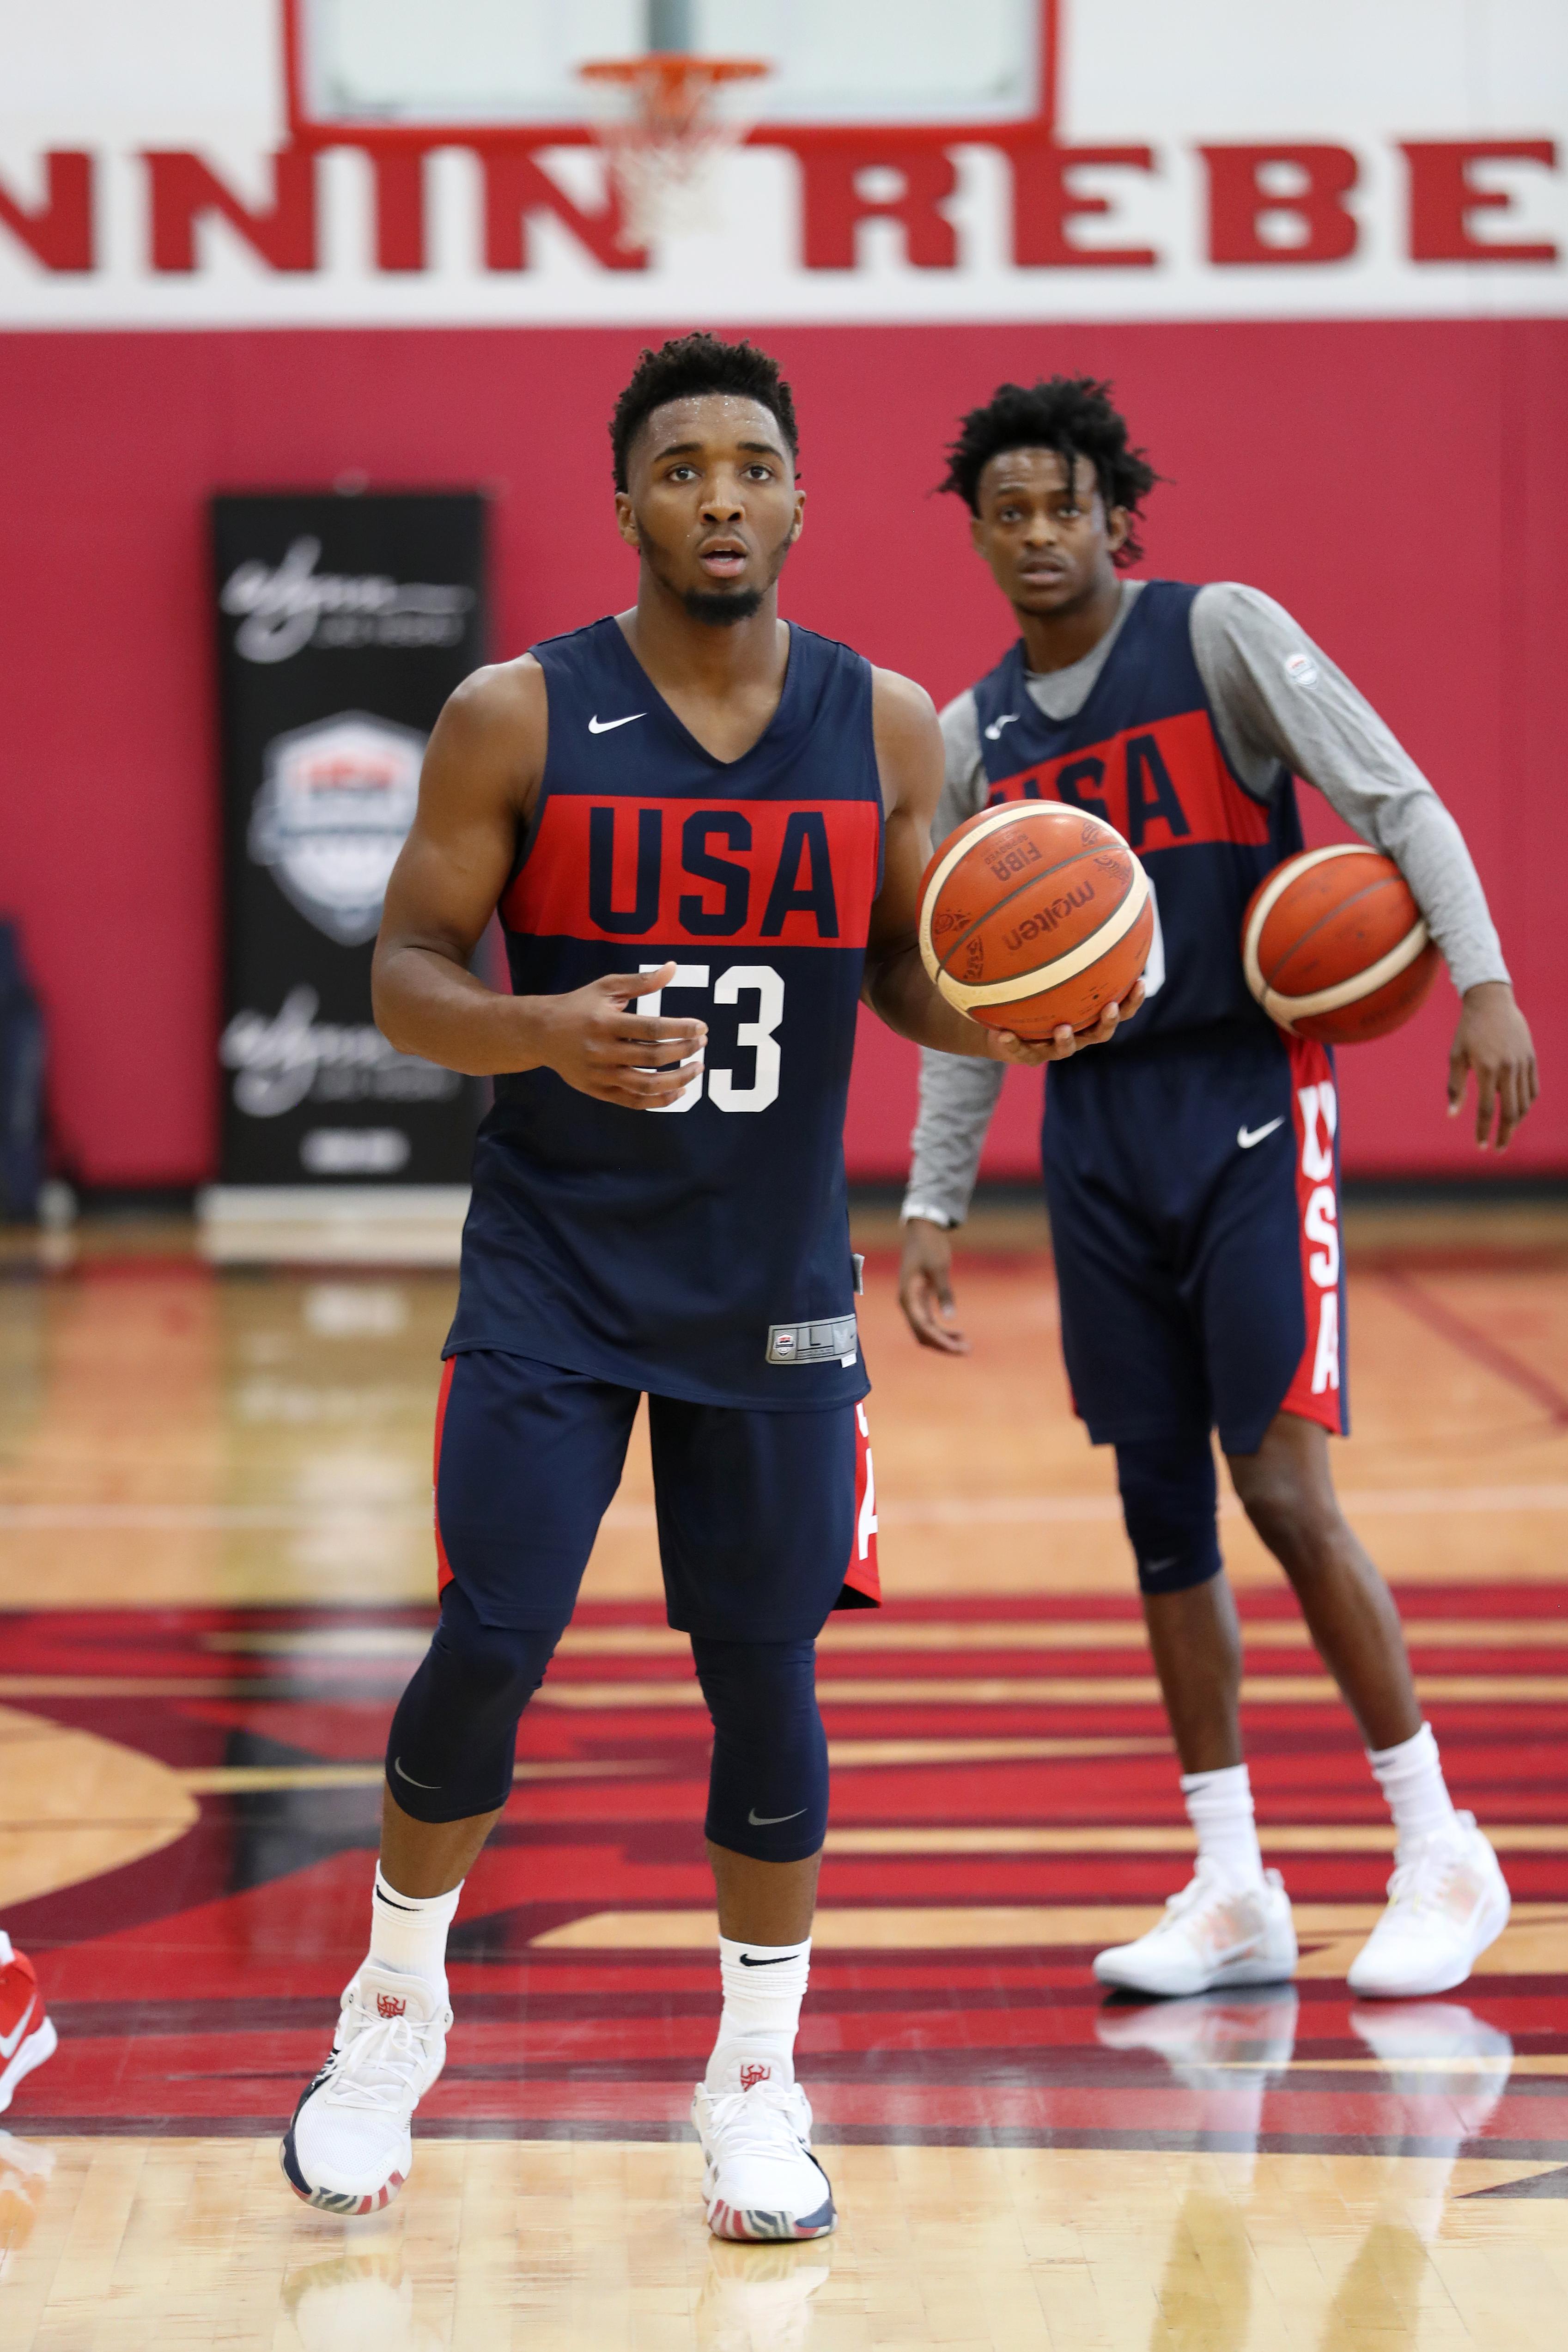 2019 USA Basketball Men's National Team Training Camp